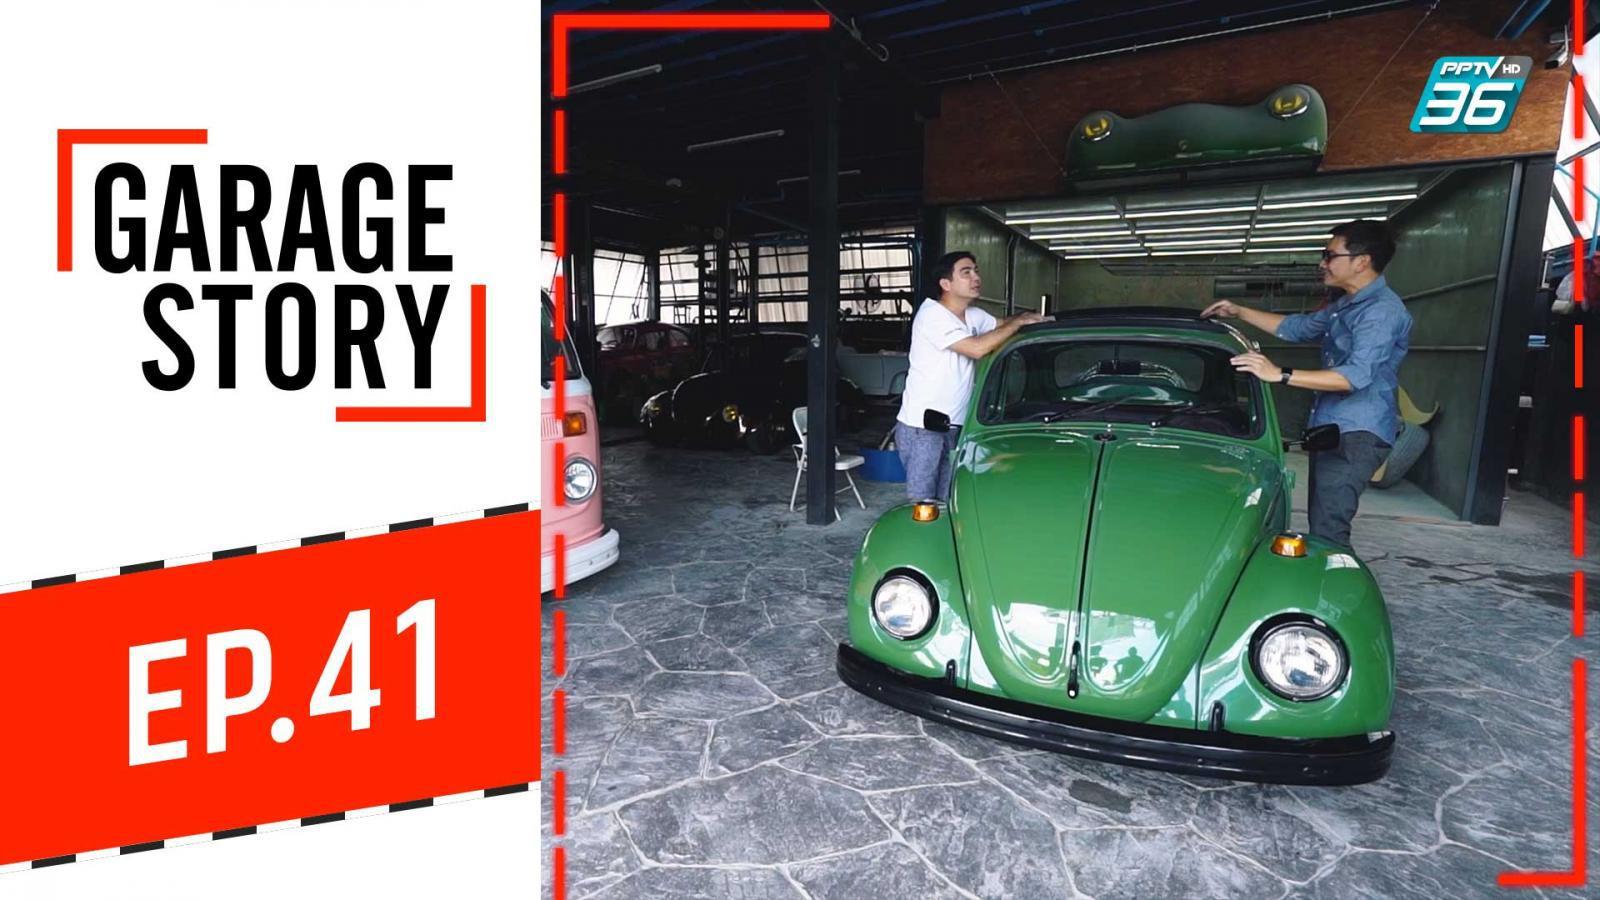 Garage Story